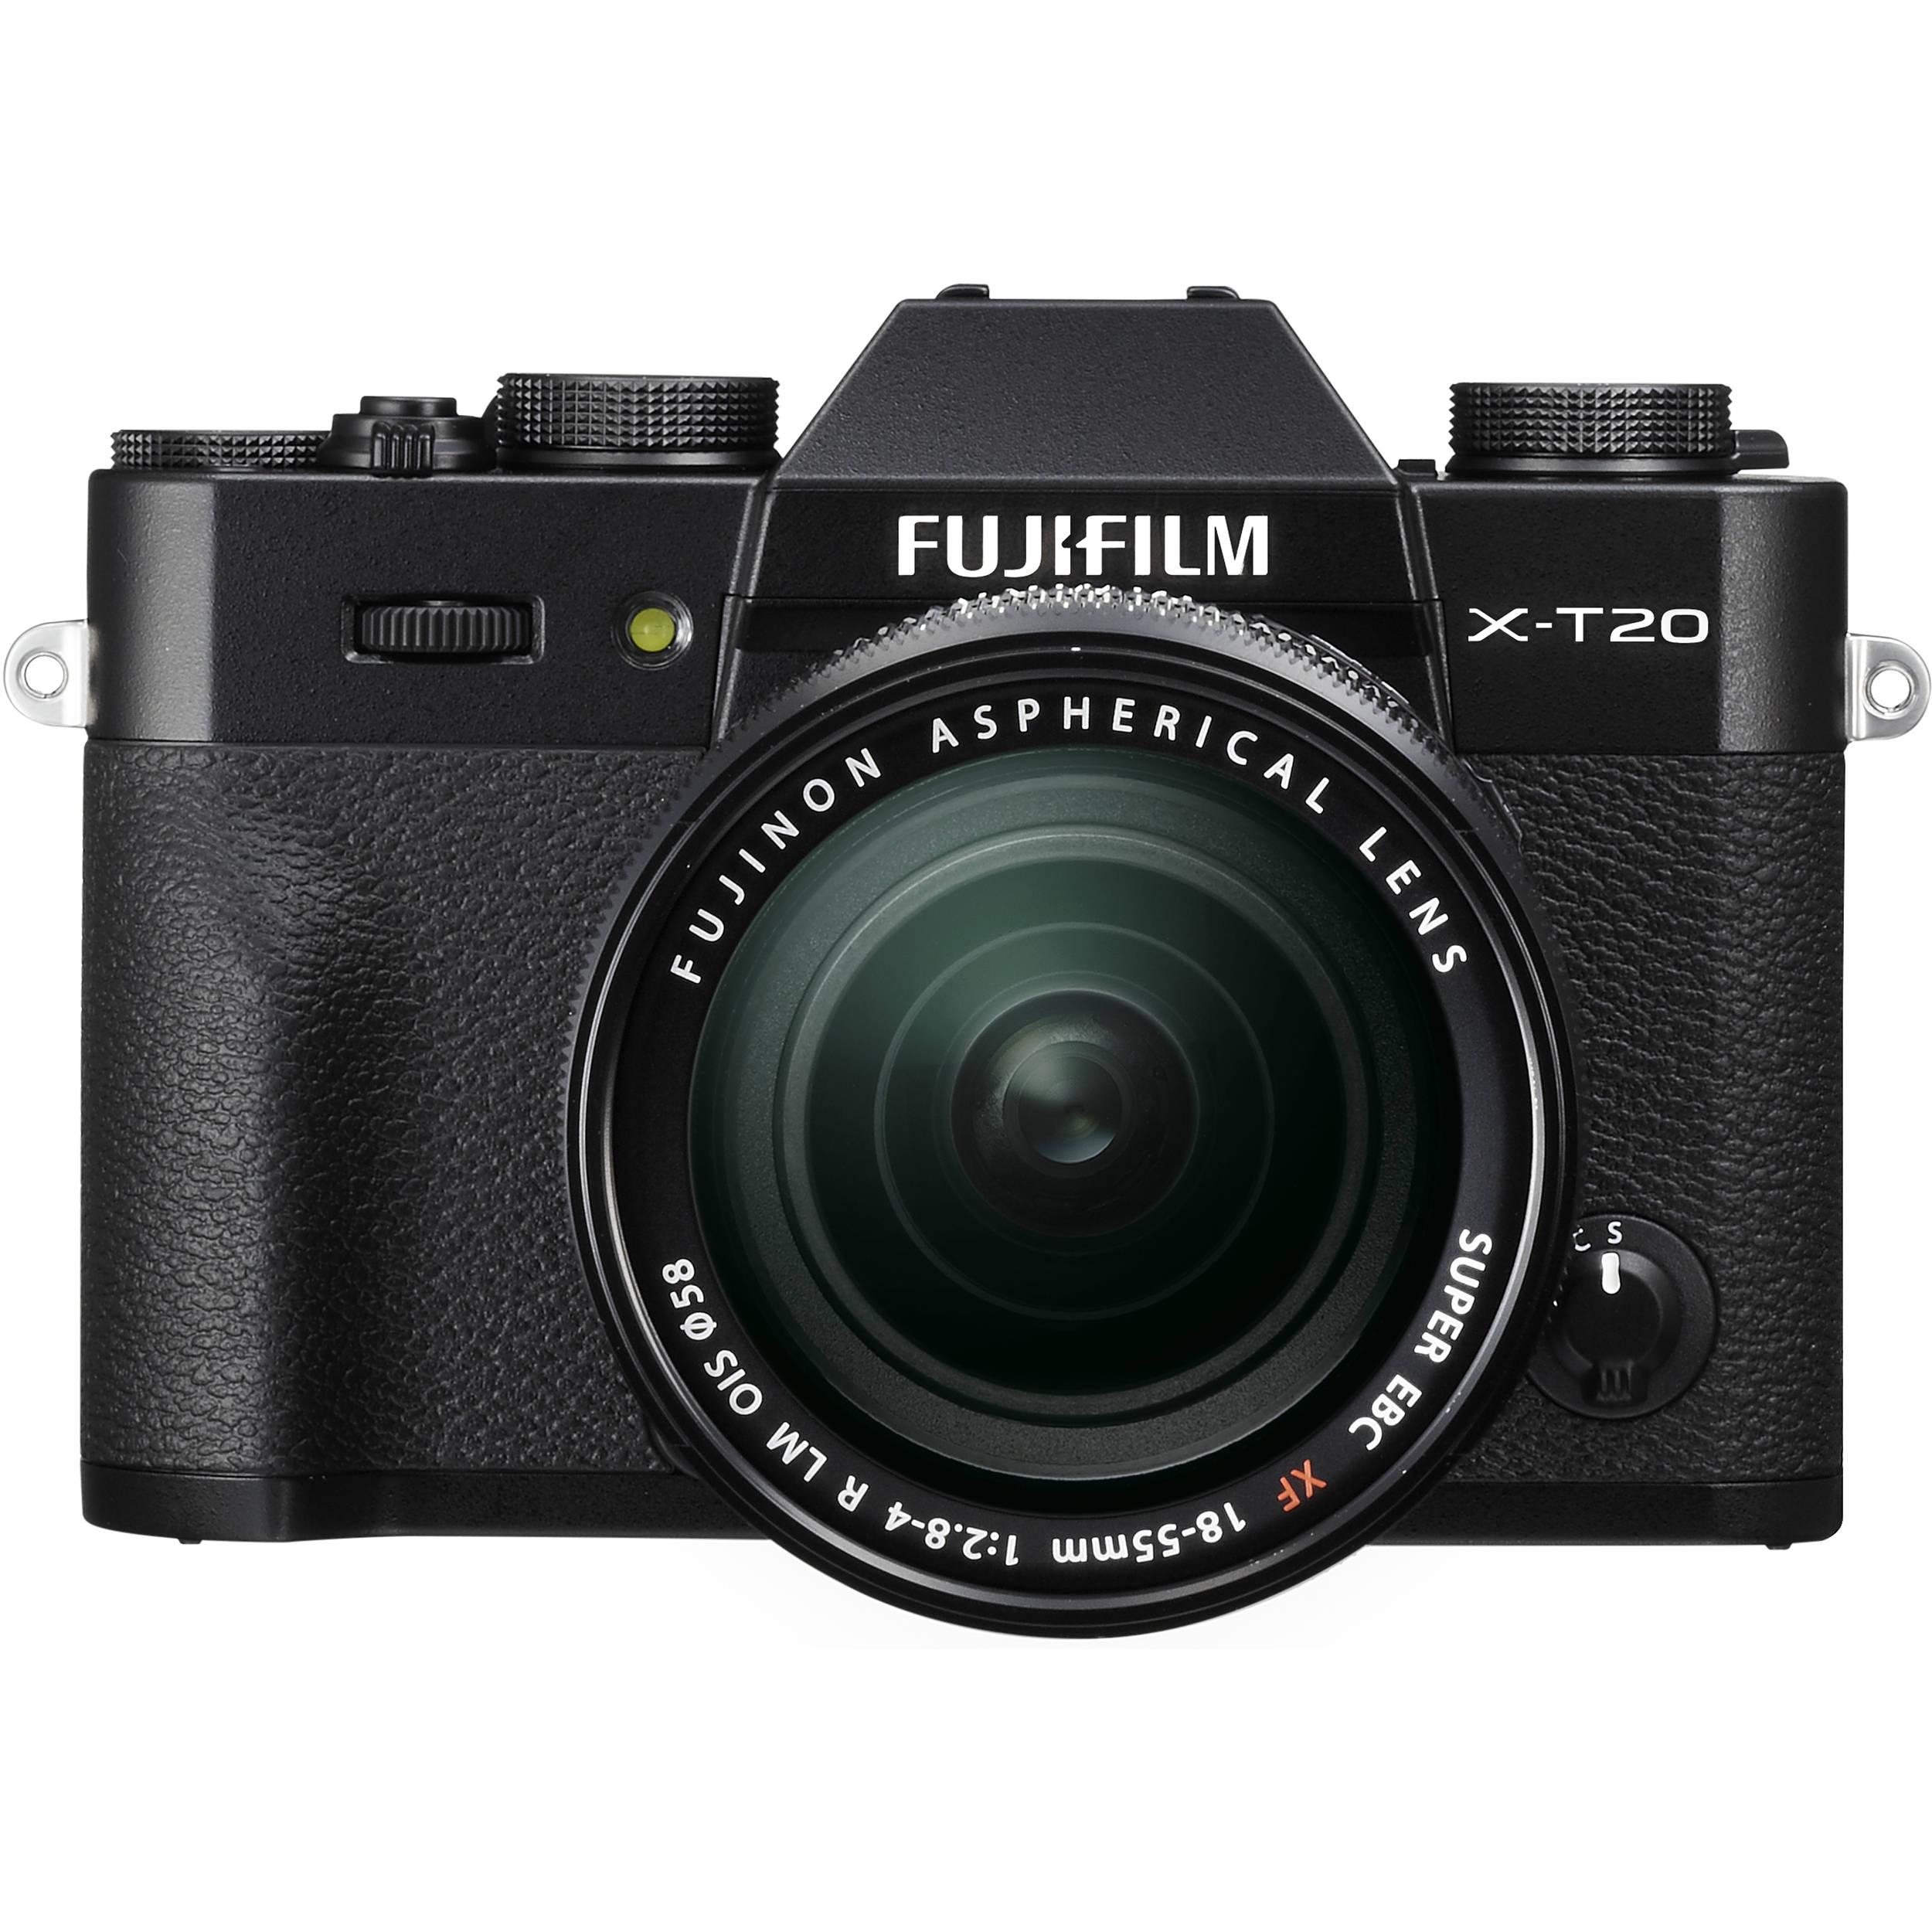 Camera Fujifilm Digital Cameras fujifilm mirrorless digital cameras bh photo video x t20 camera with 18 55mm lens black